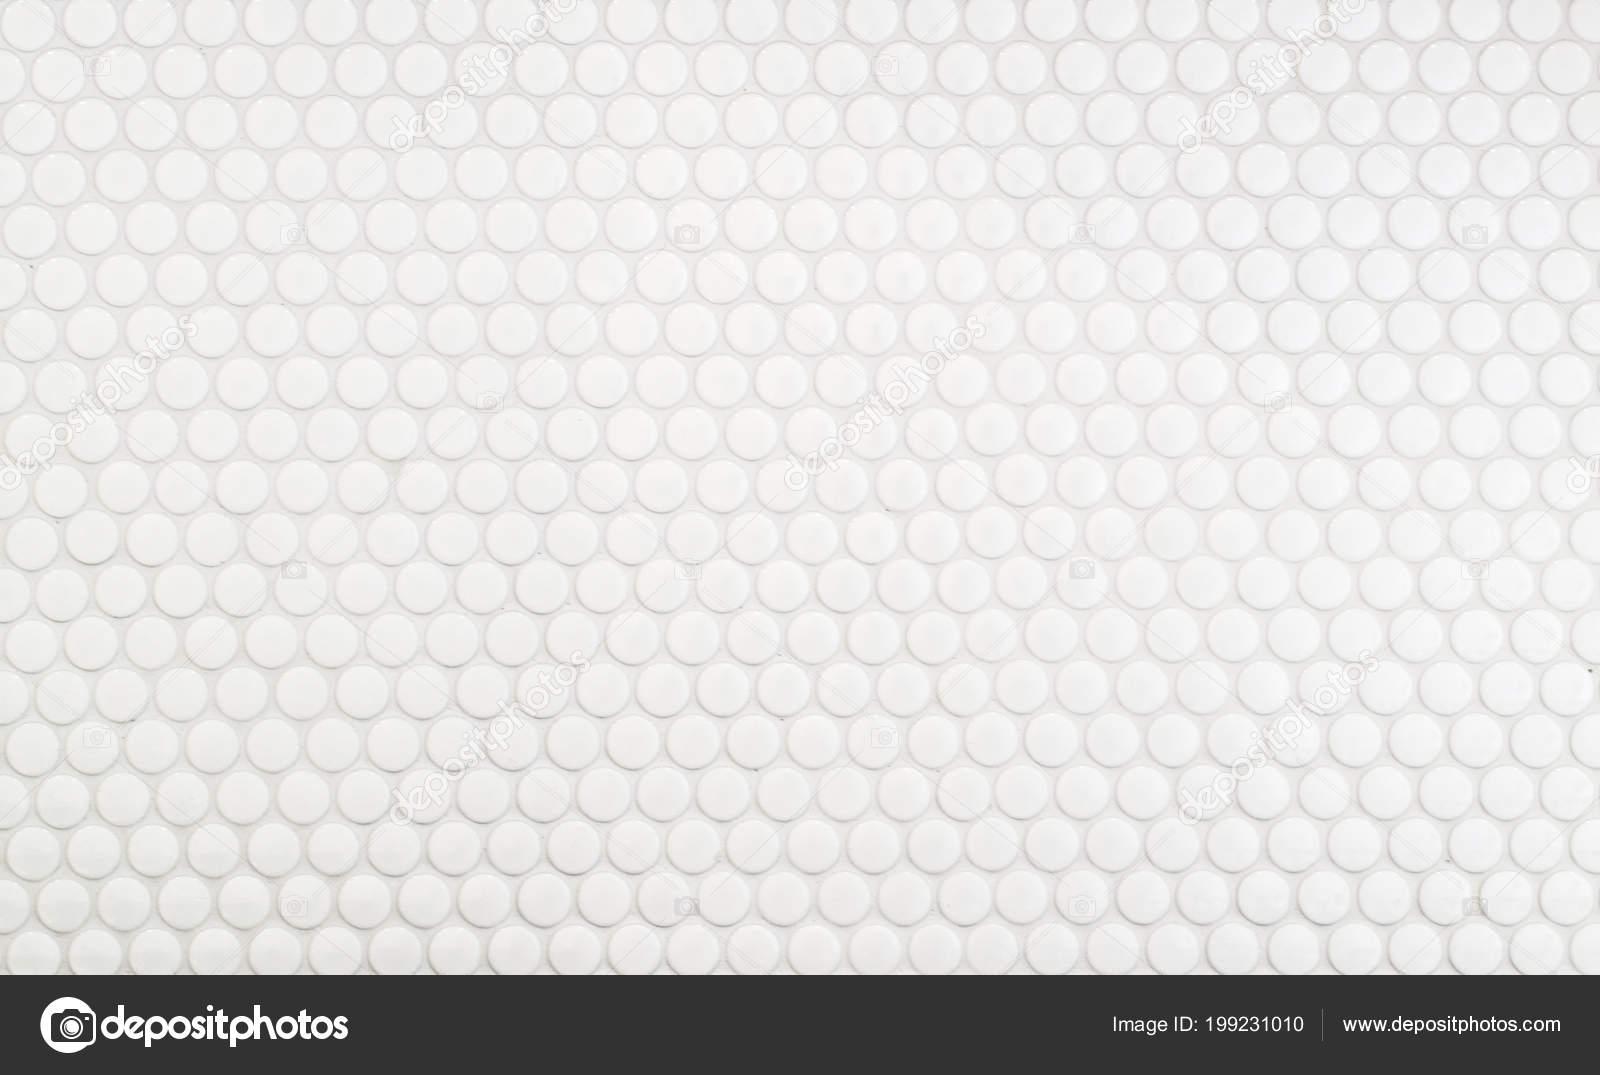 https depositphotos com 199231010 stock photo circle tile backsplash kitchen background html